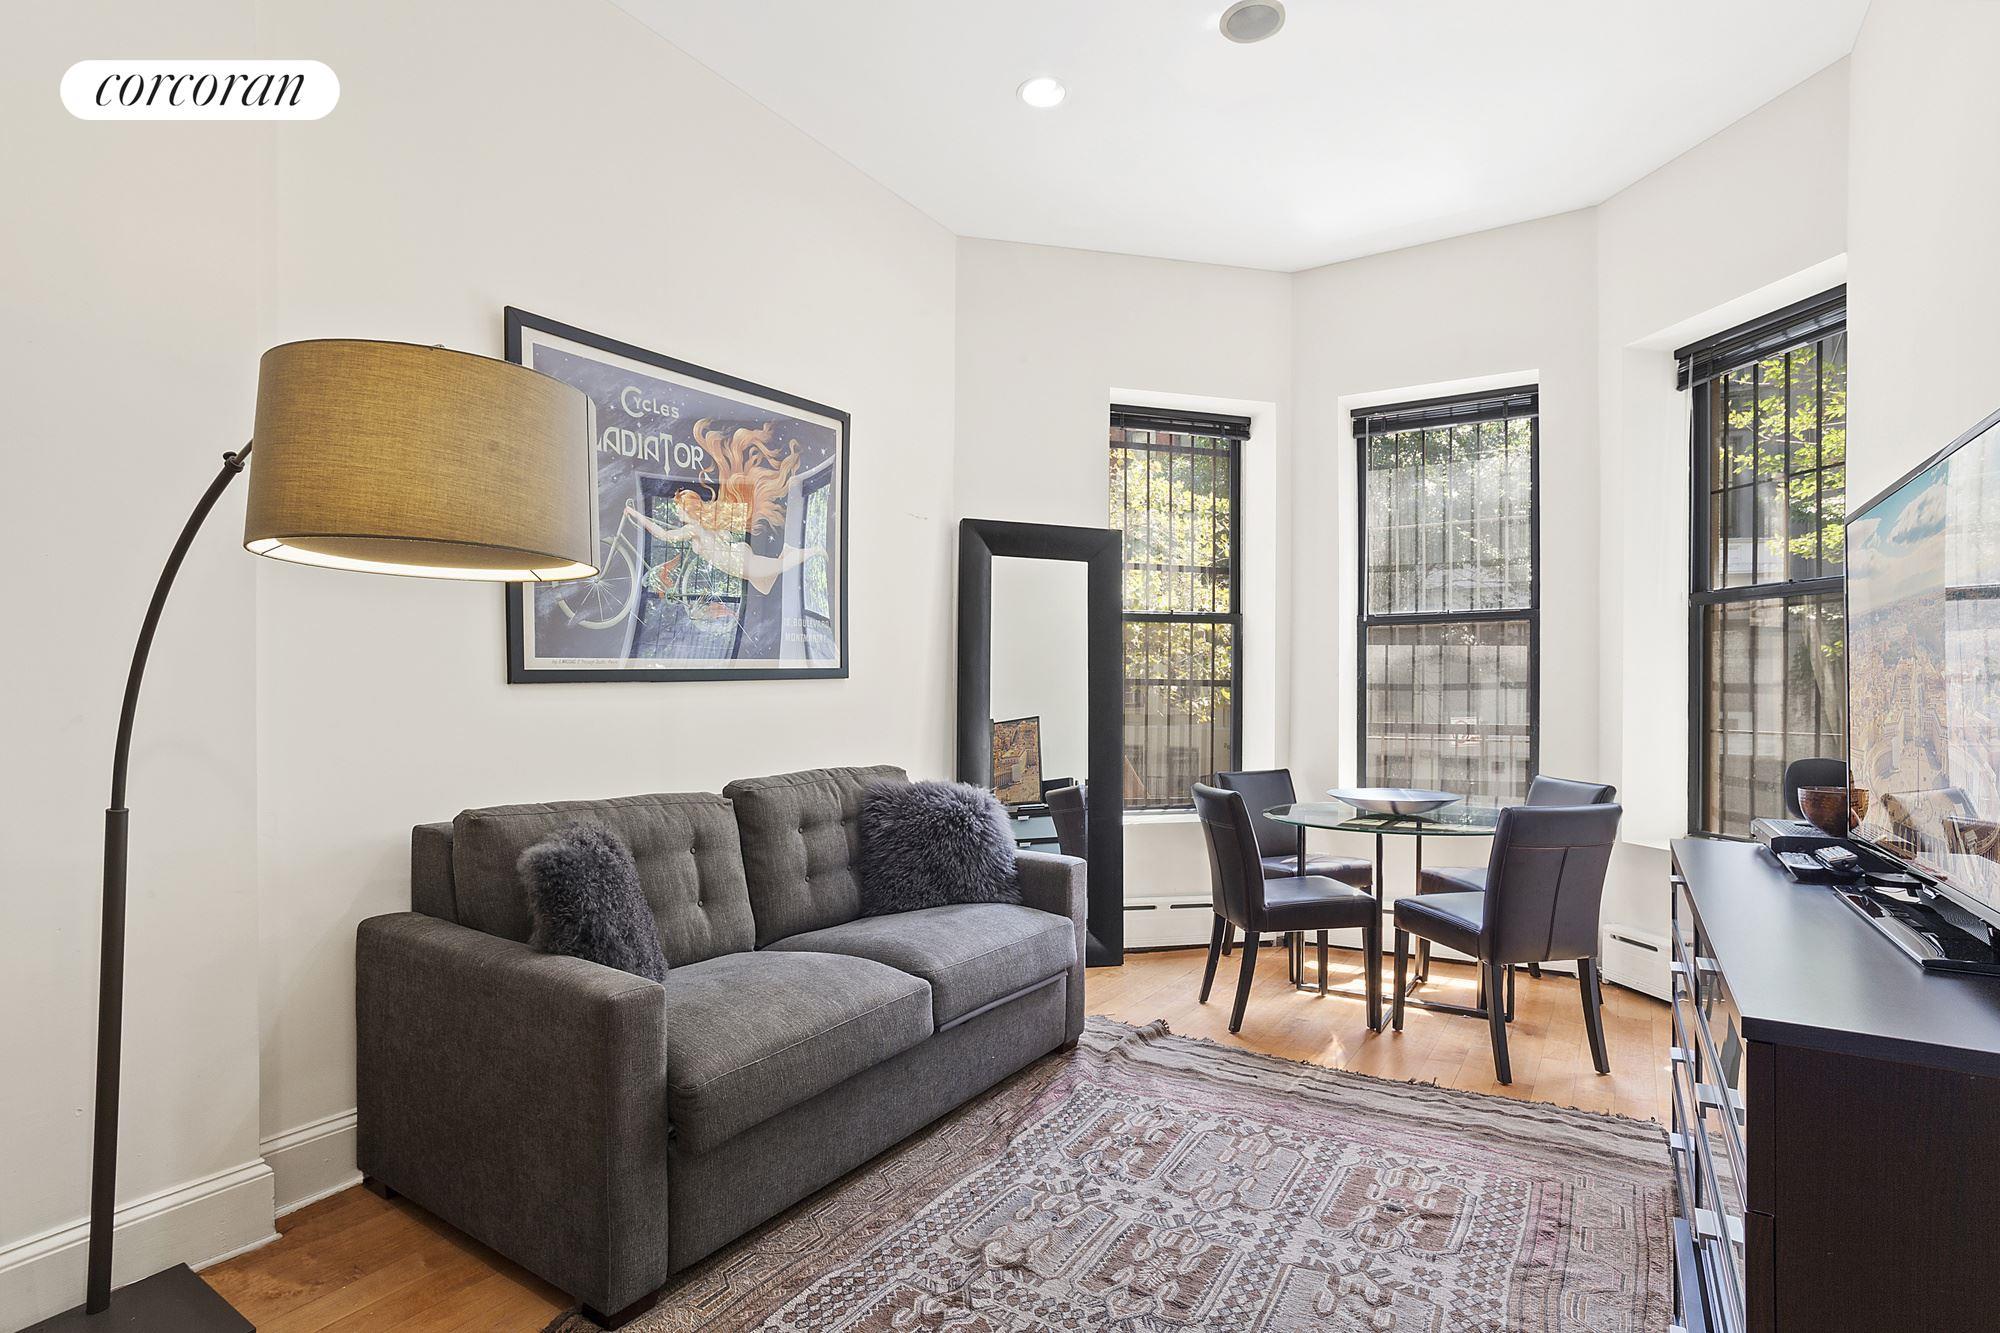 Corcoran, 25 West 83rd Street, Apt. 2F, Upper West Side Rentals ...